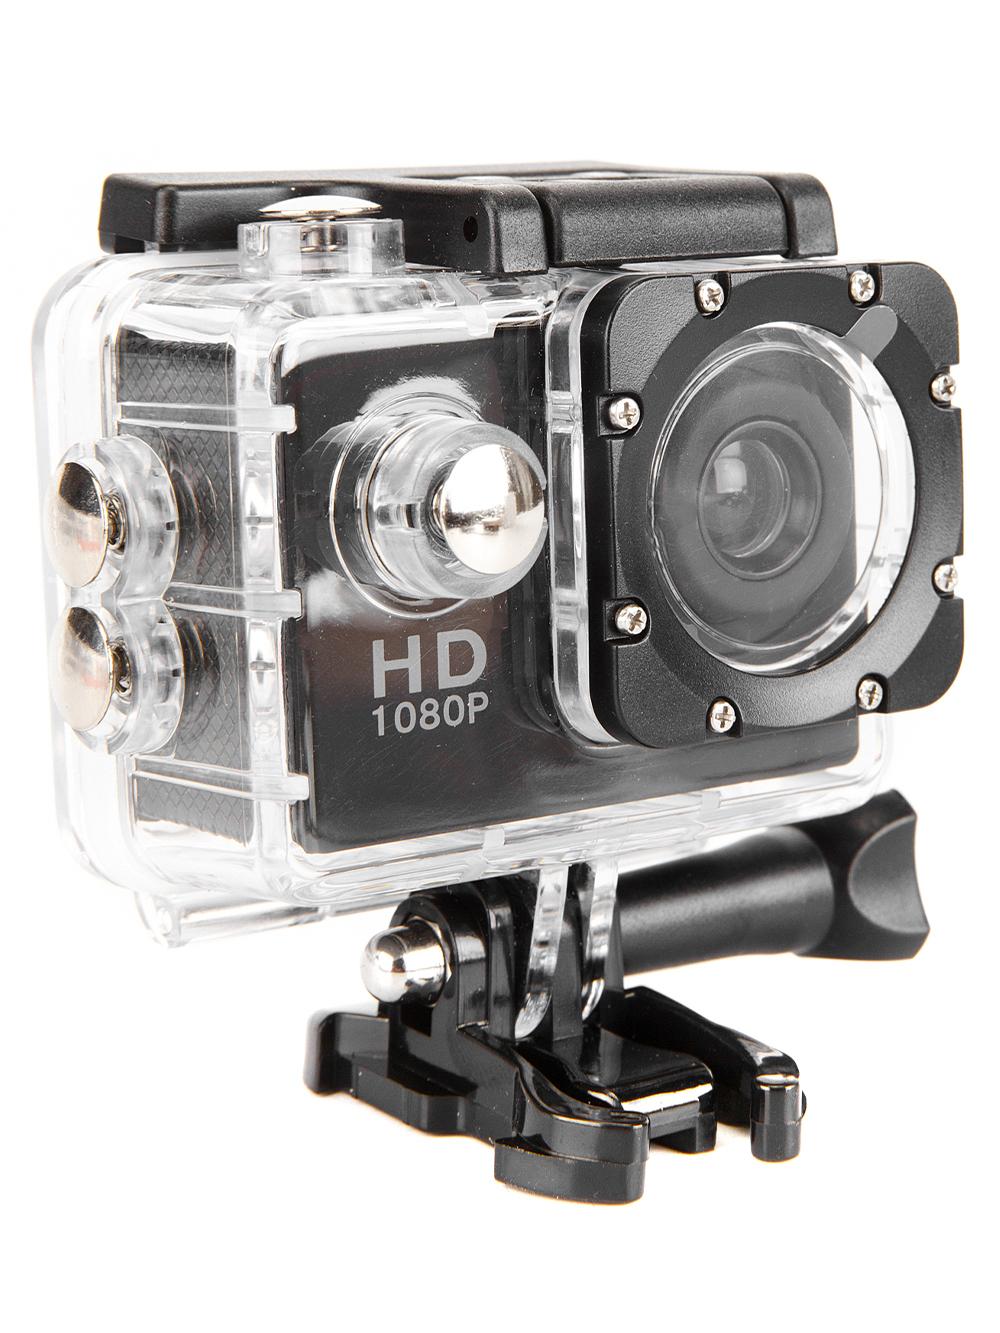 экшн-камера pozitron sports cam hd 1080p